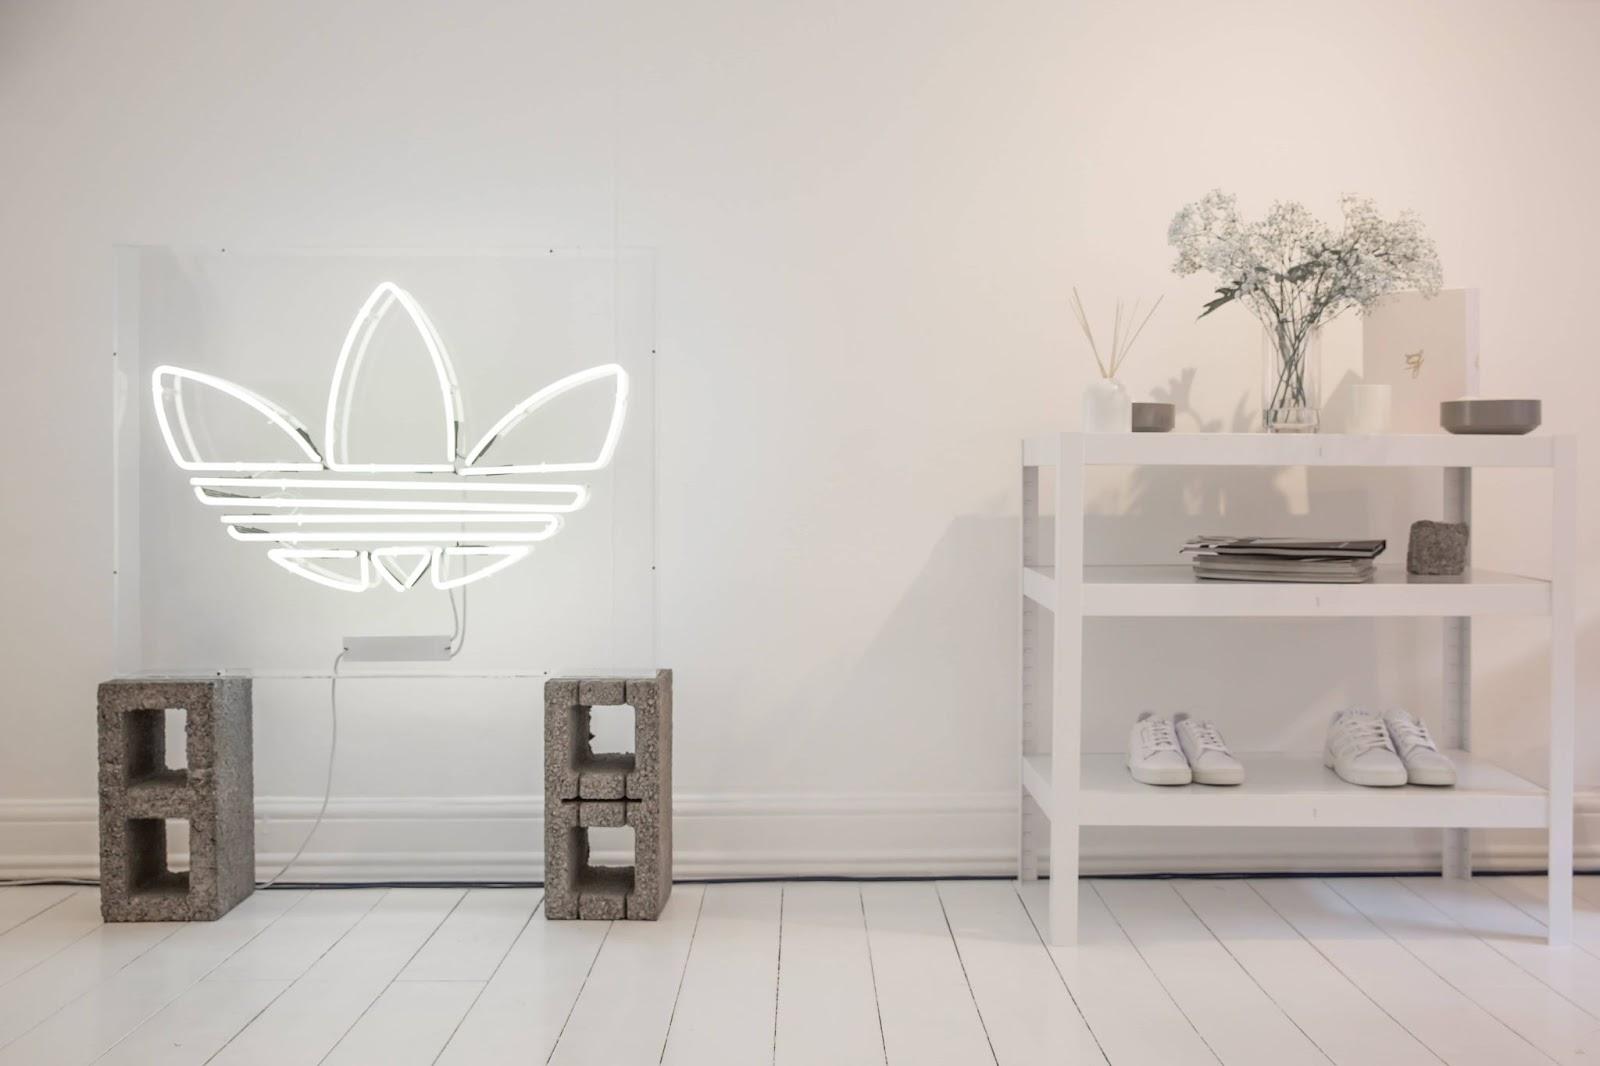 logo-adidas-su-sfondo-parete-bianca